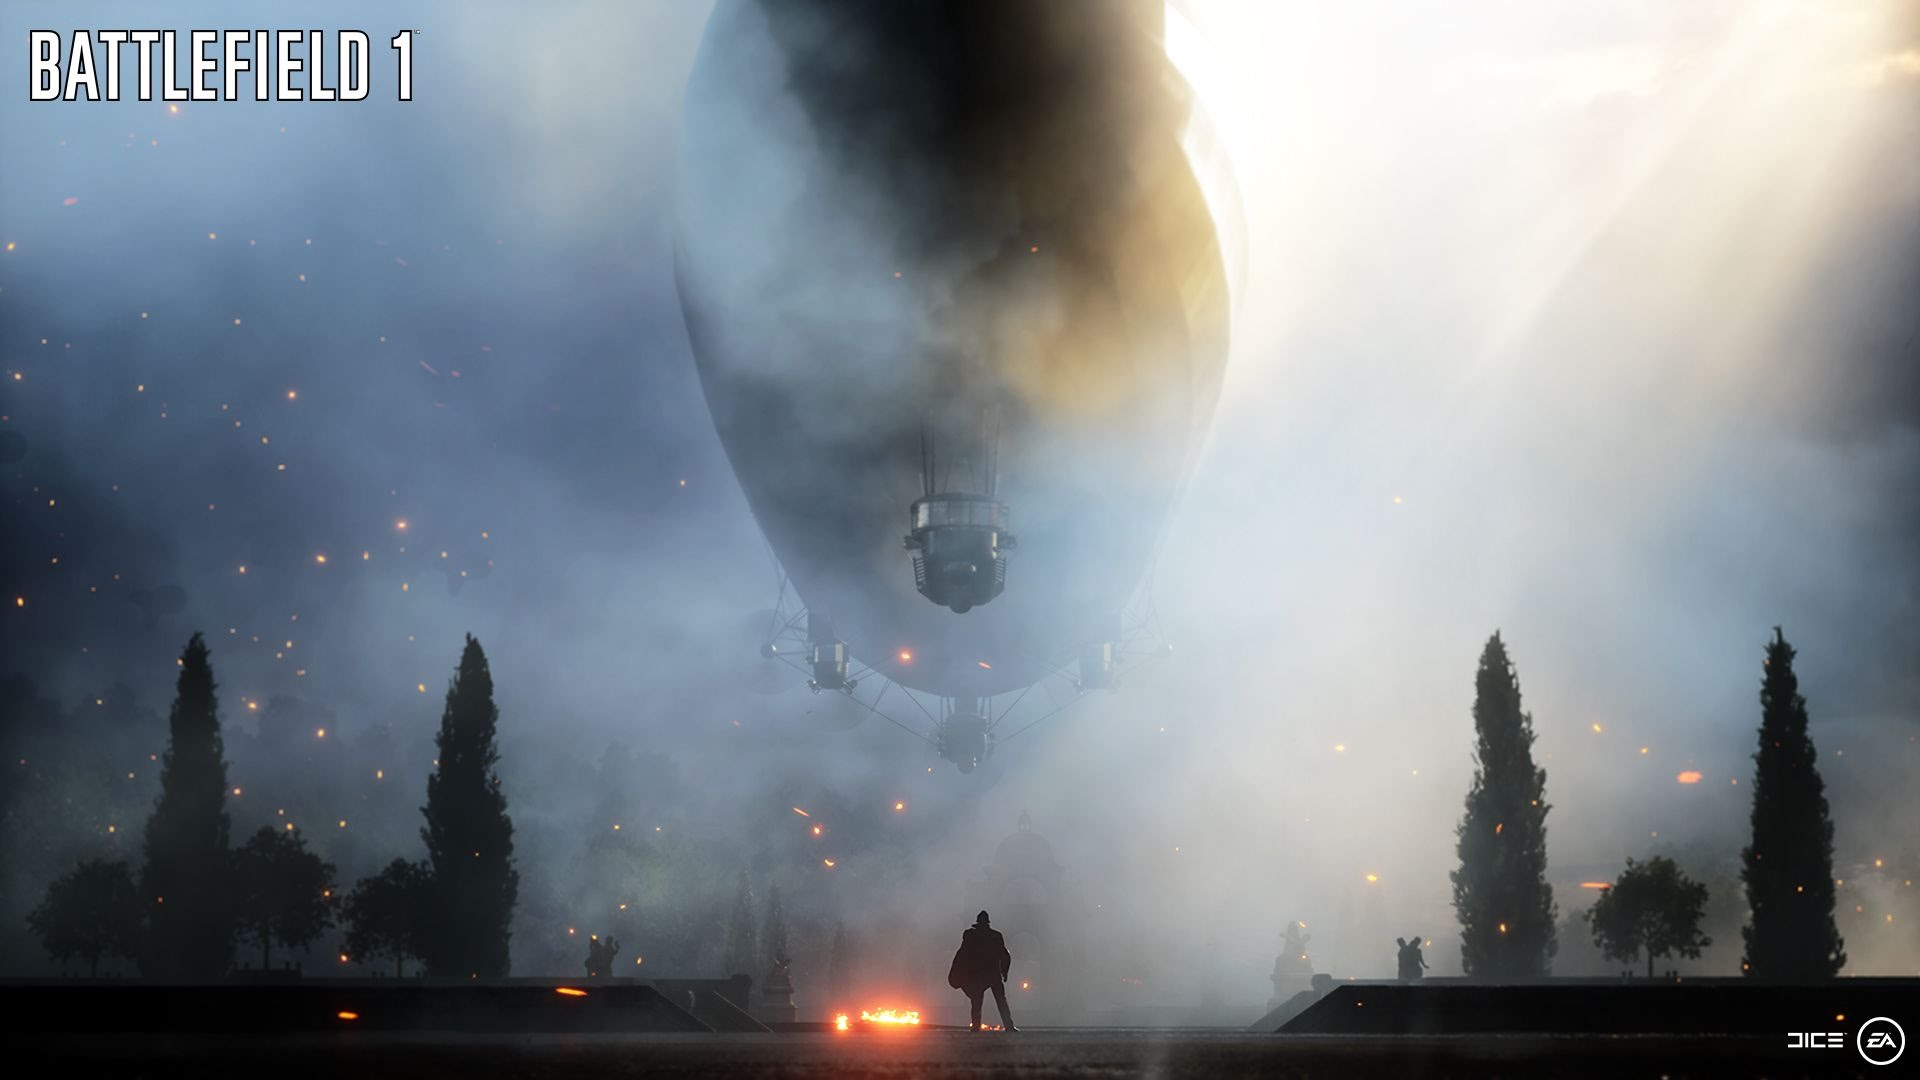 Battlefield 1 (EA: Dice 2016)